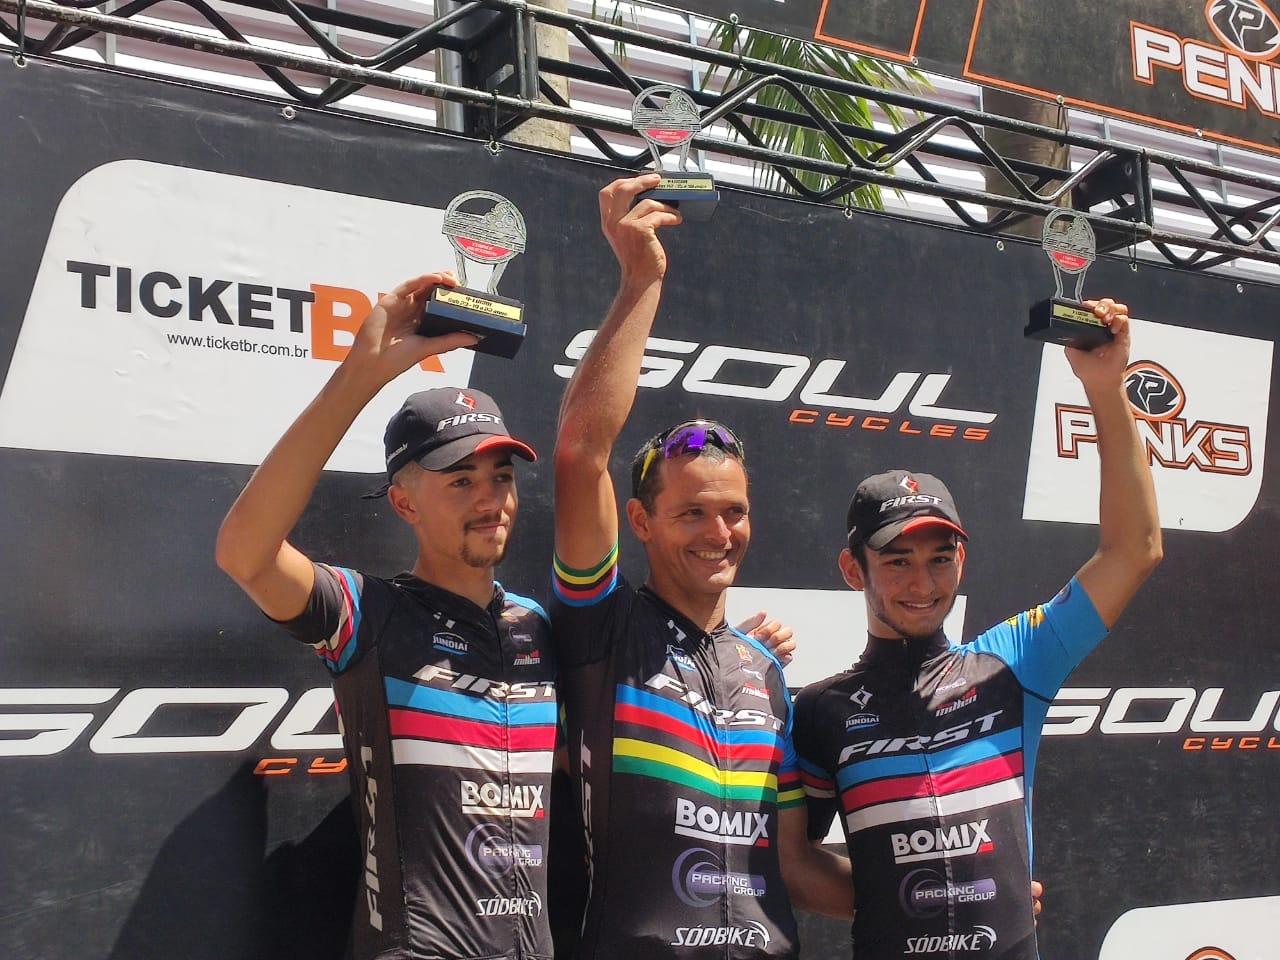 Lucas, Carlos Henrique e Vicente comemoram bons resultados do TIME Jundiaí